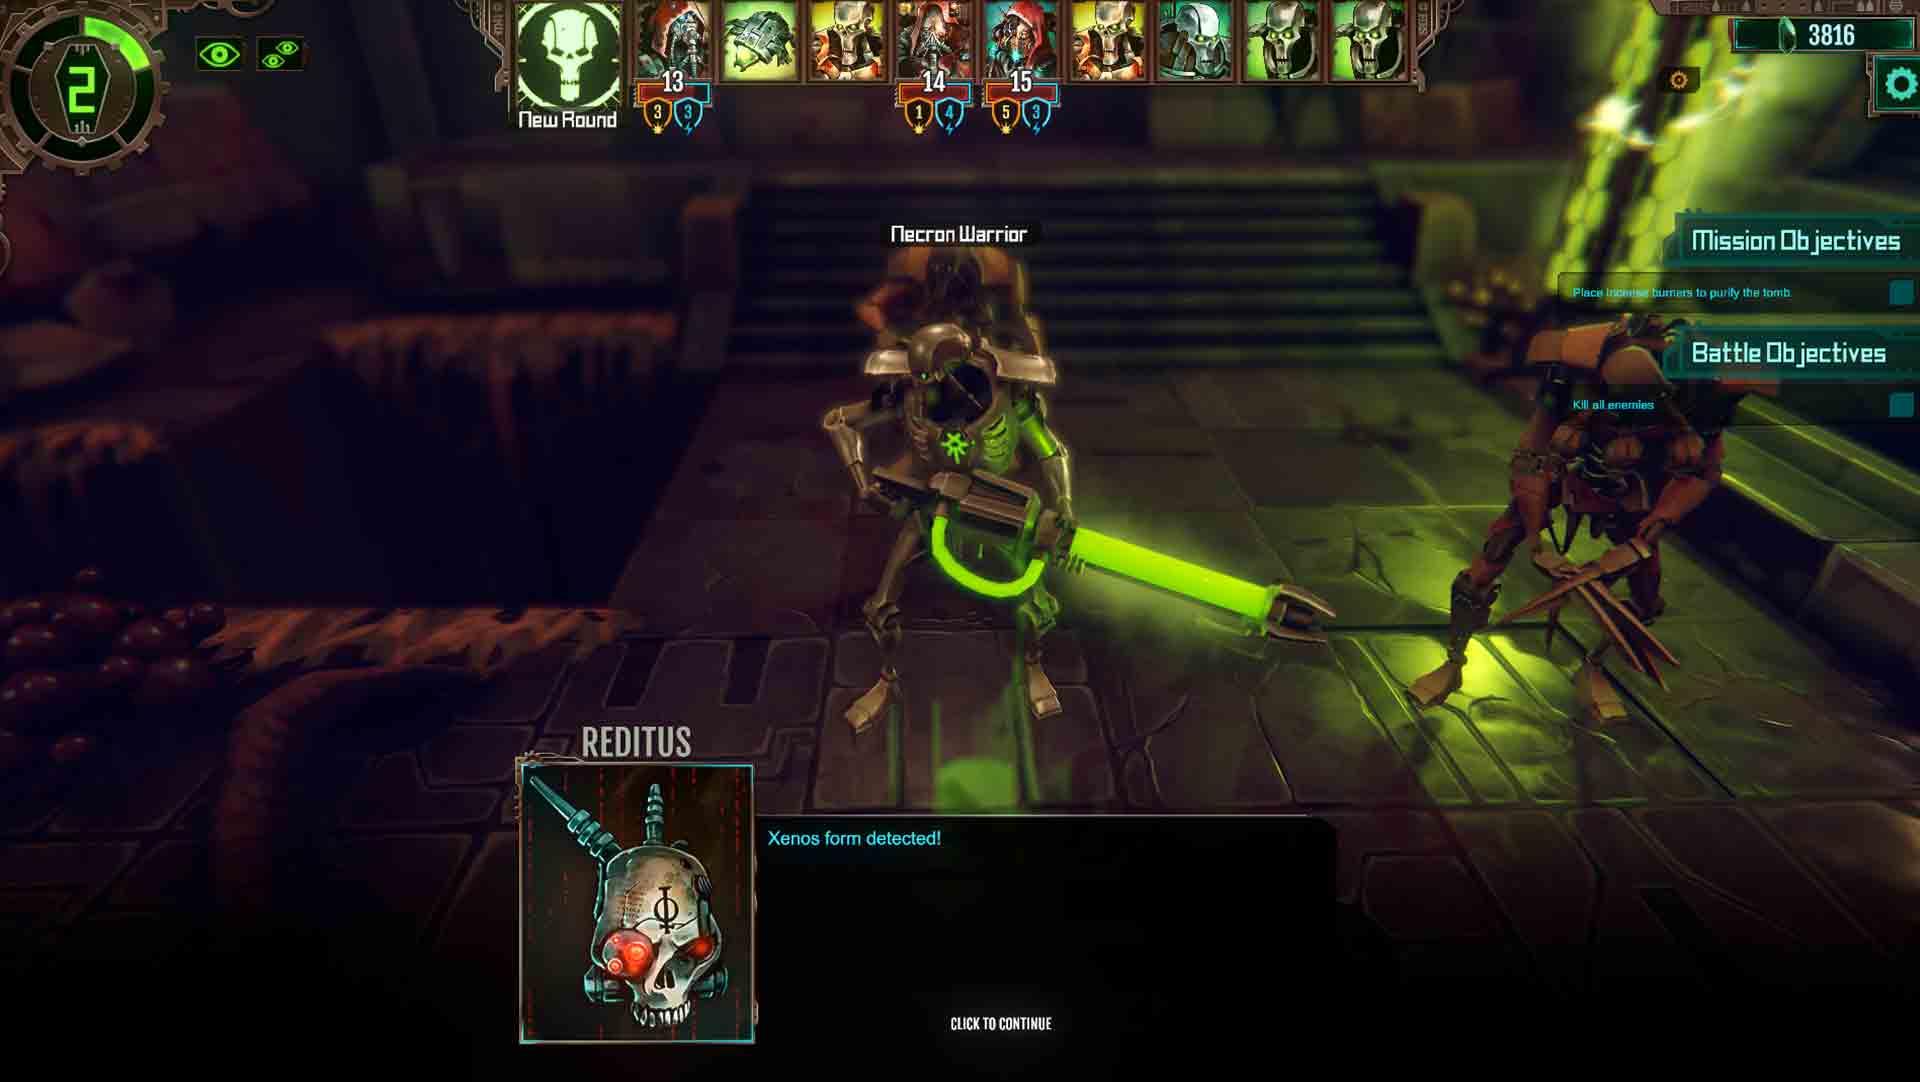 Warhammer 40,000: Mechanicus OMNISSIAH EDITION game image